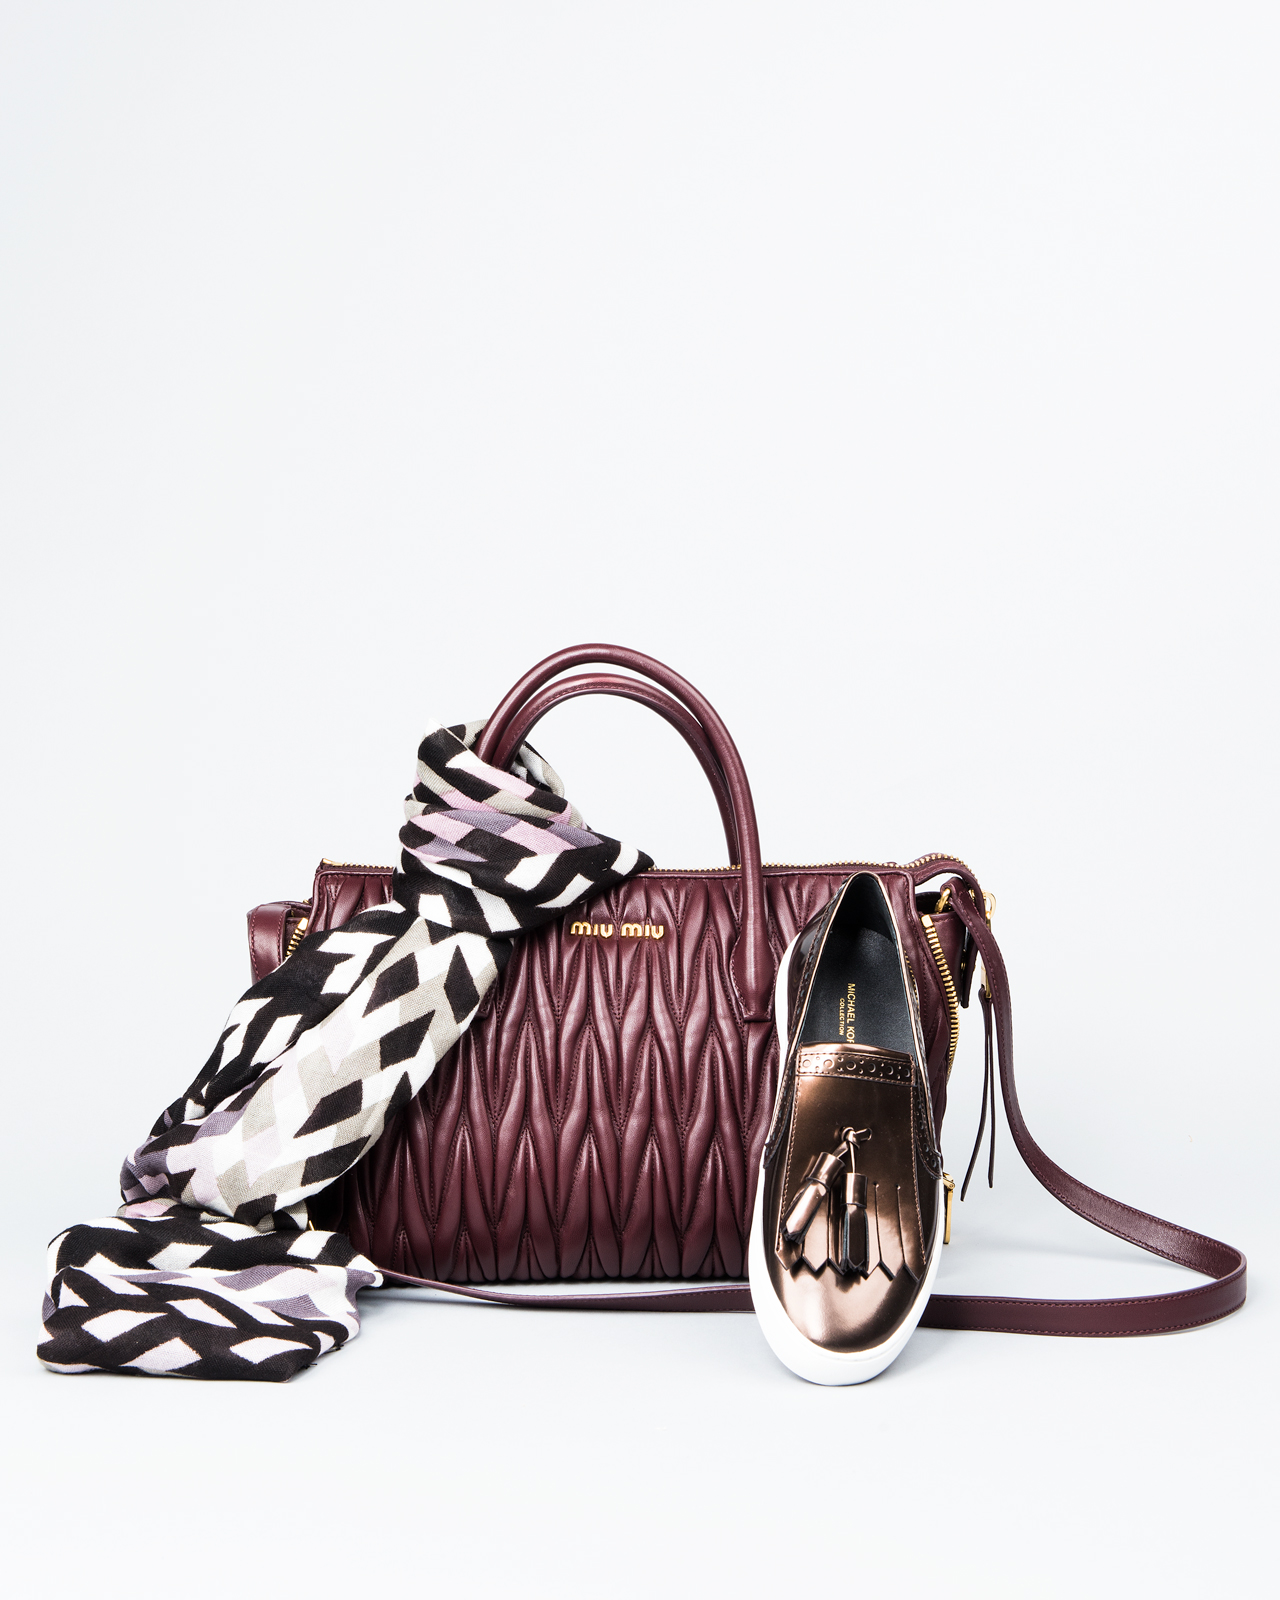 Shoes-&-Purse.jpg